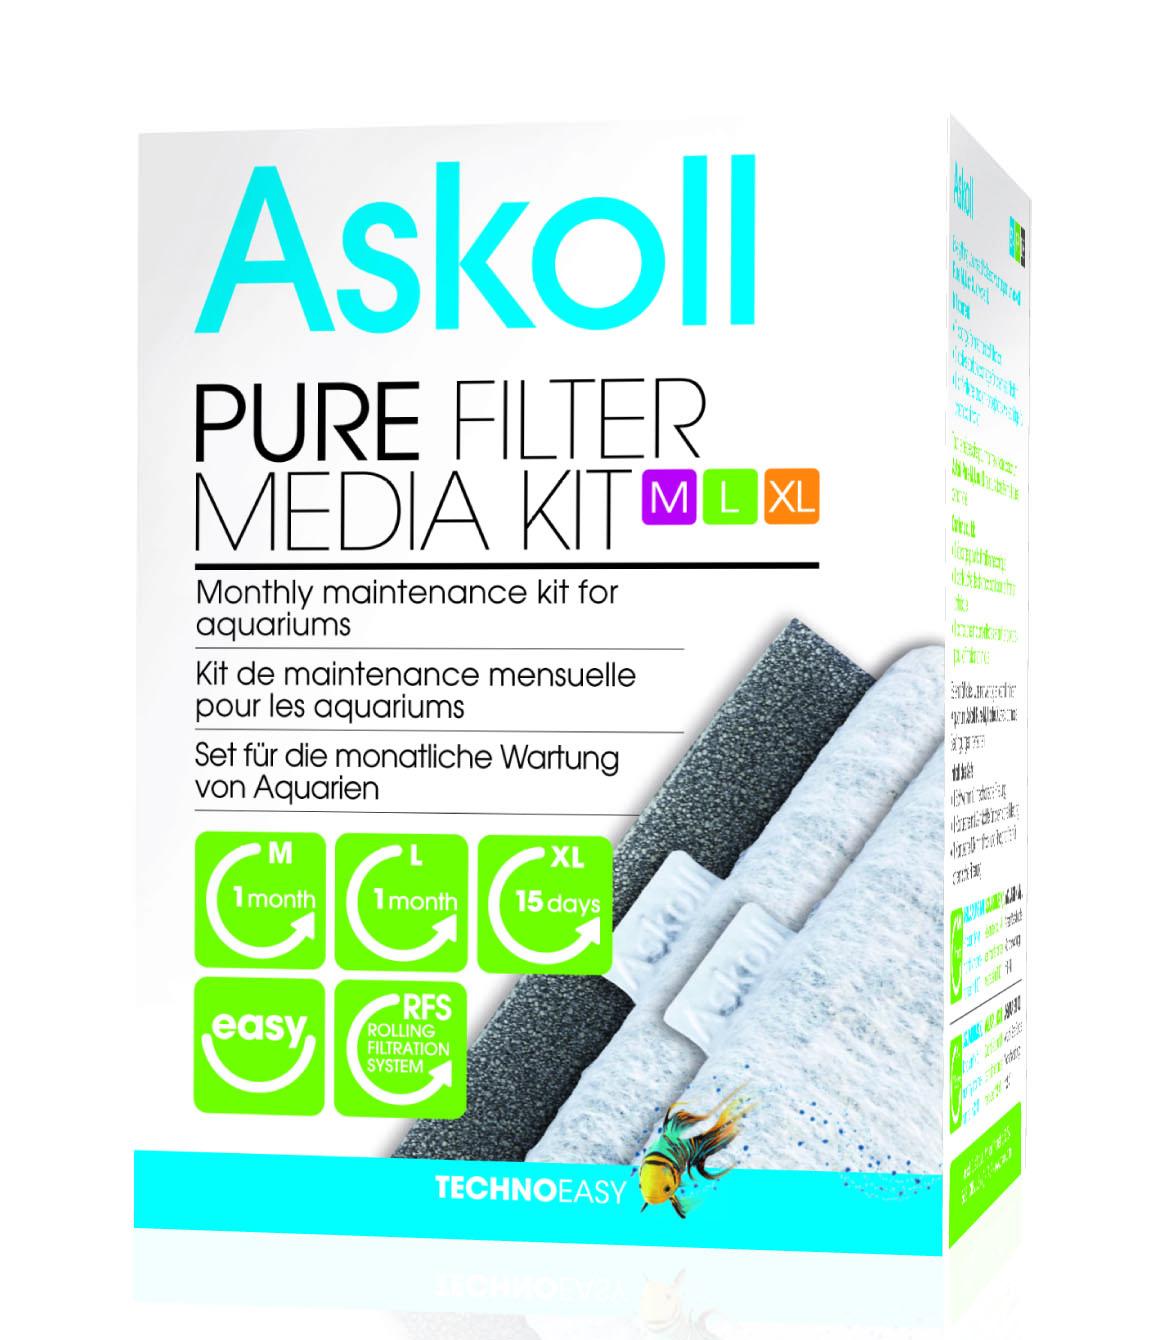 Pure Filter Media Kit Mlxl